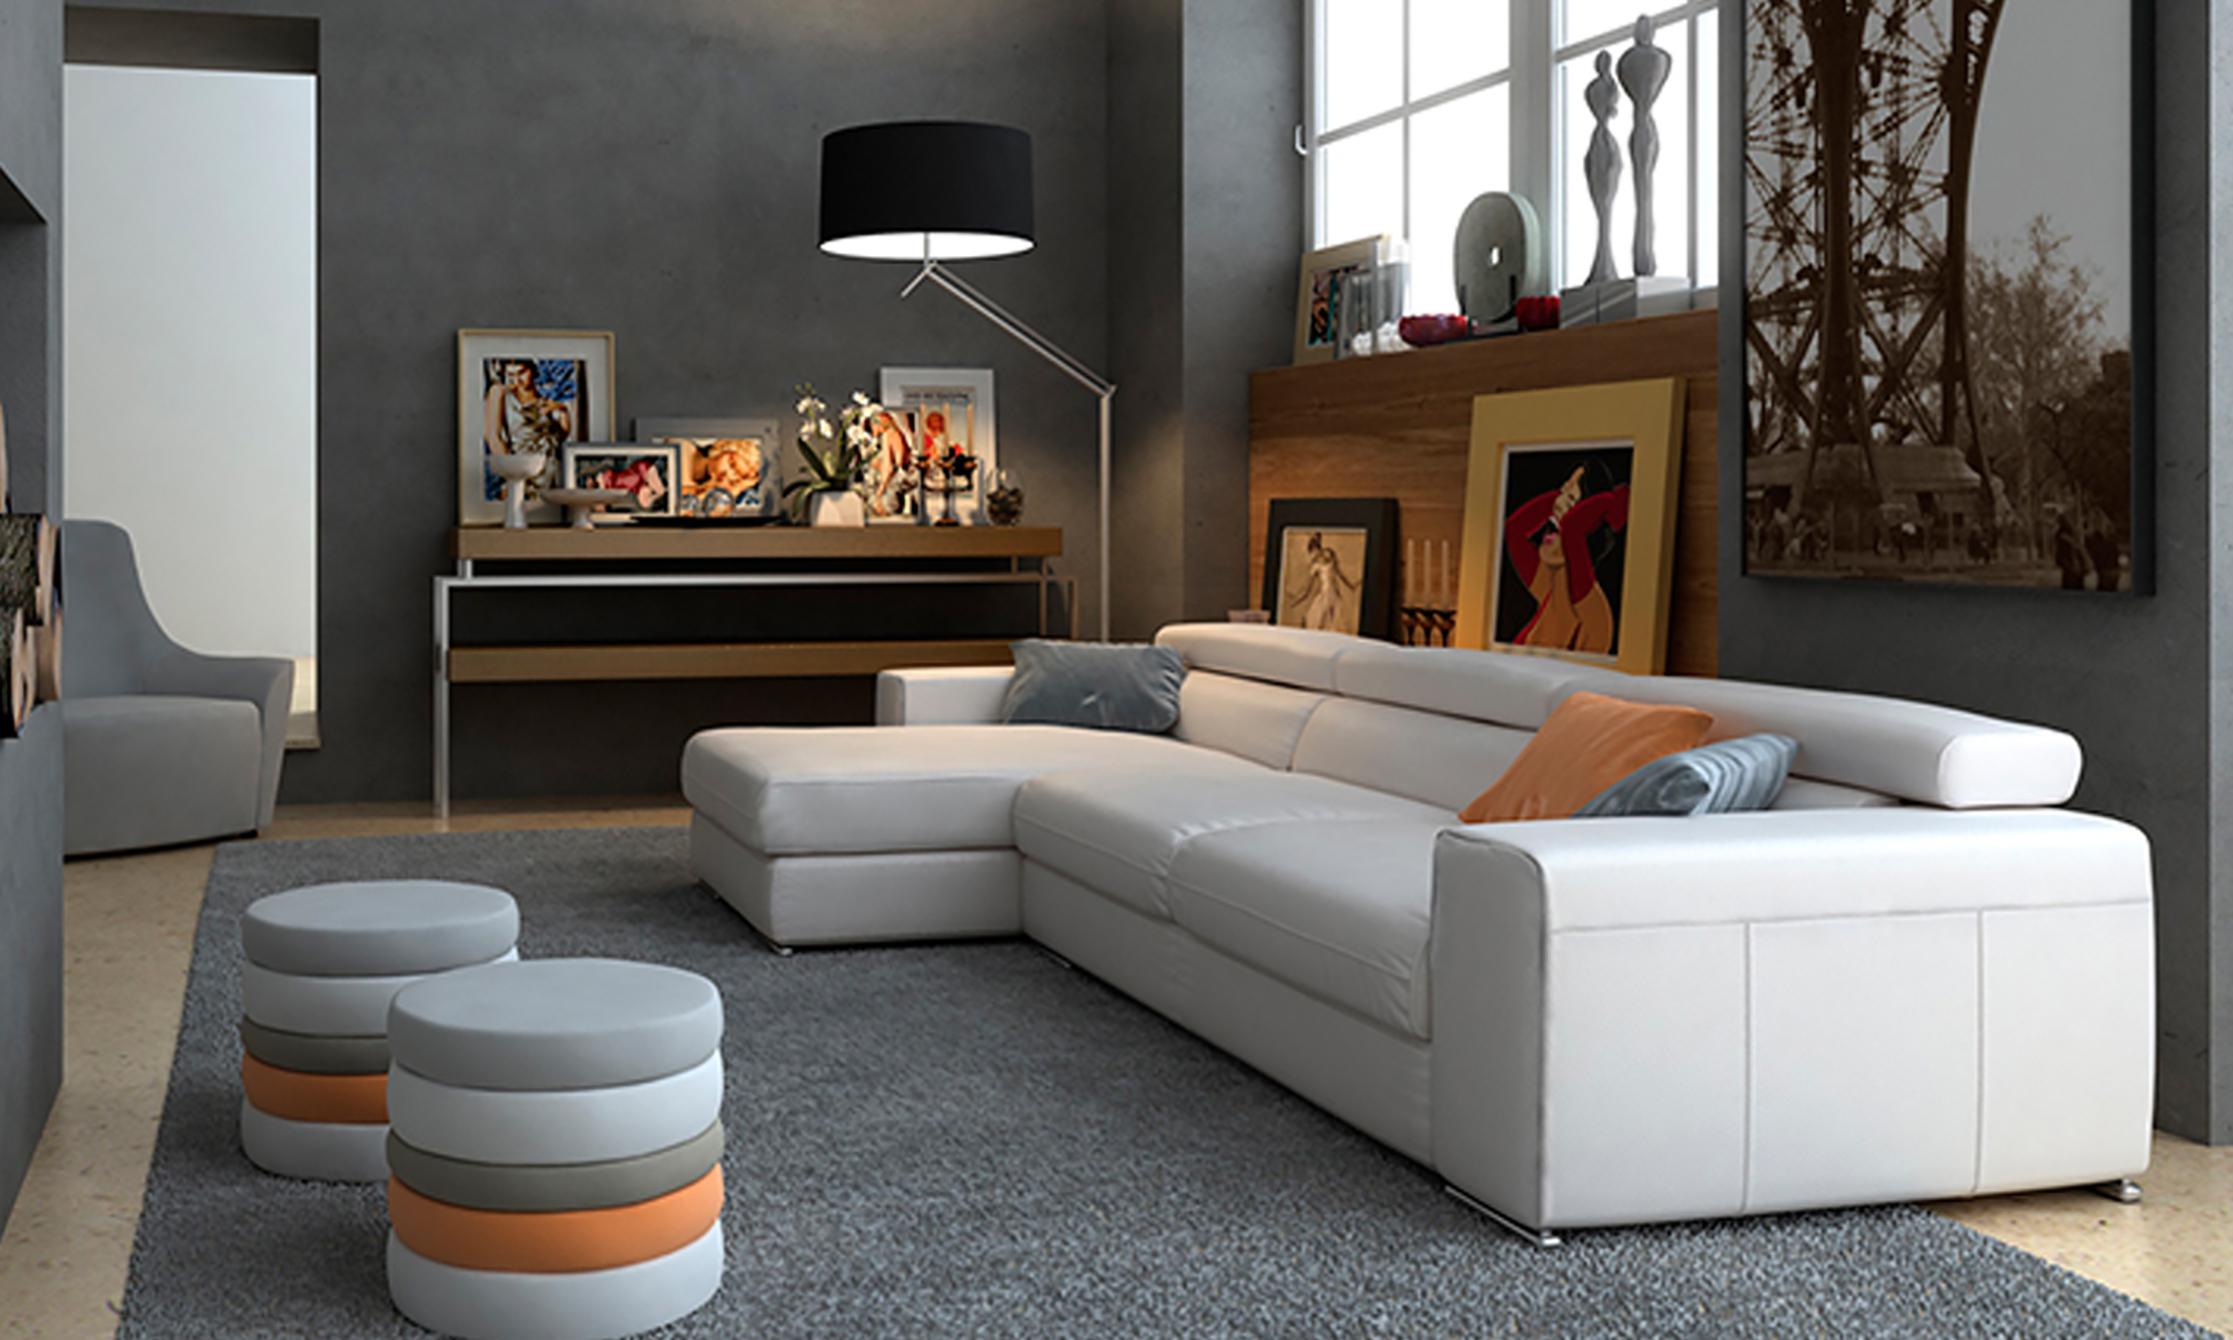 sofá bassico abbiamo360